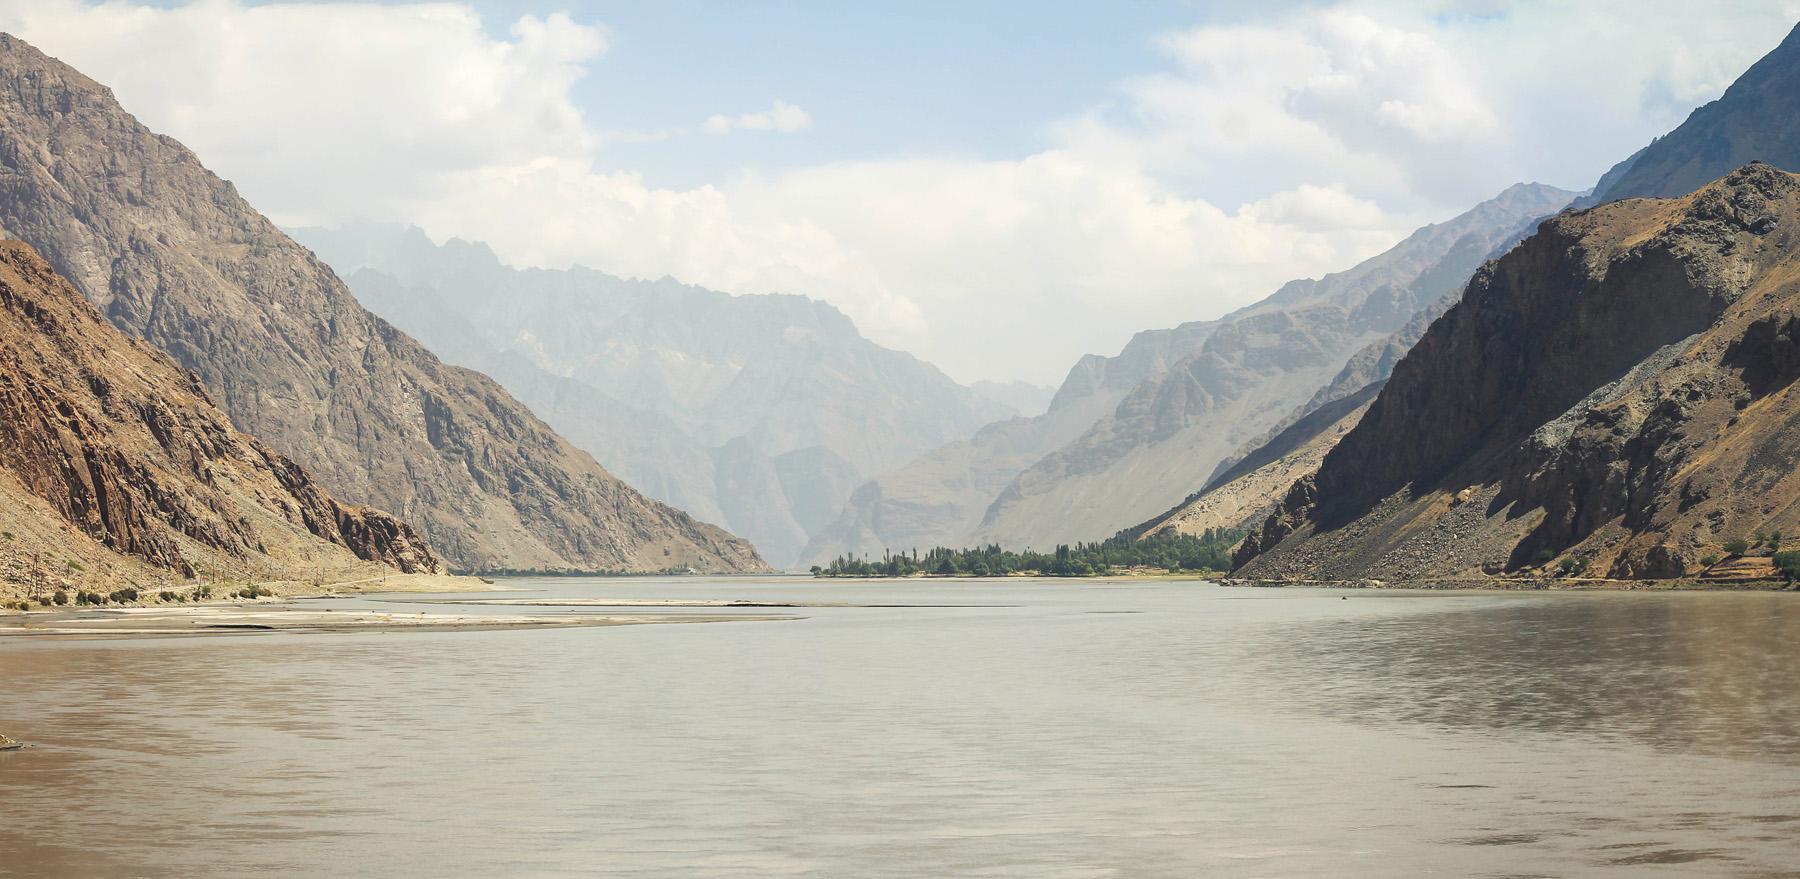 Rzeka Pandż Pamir